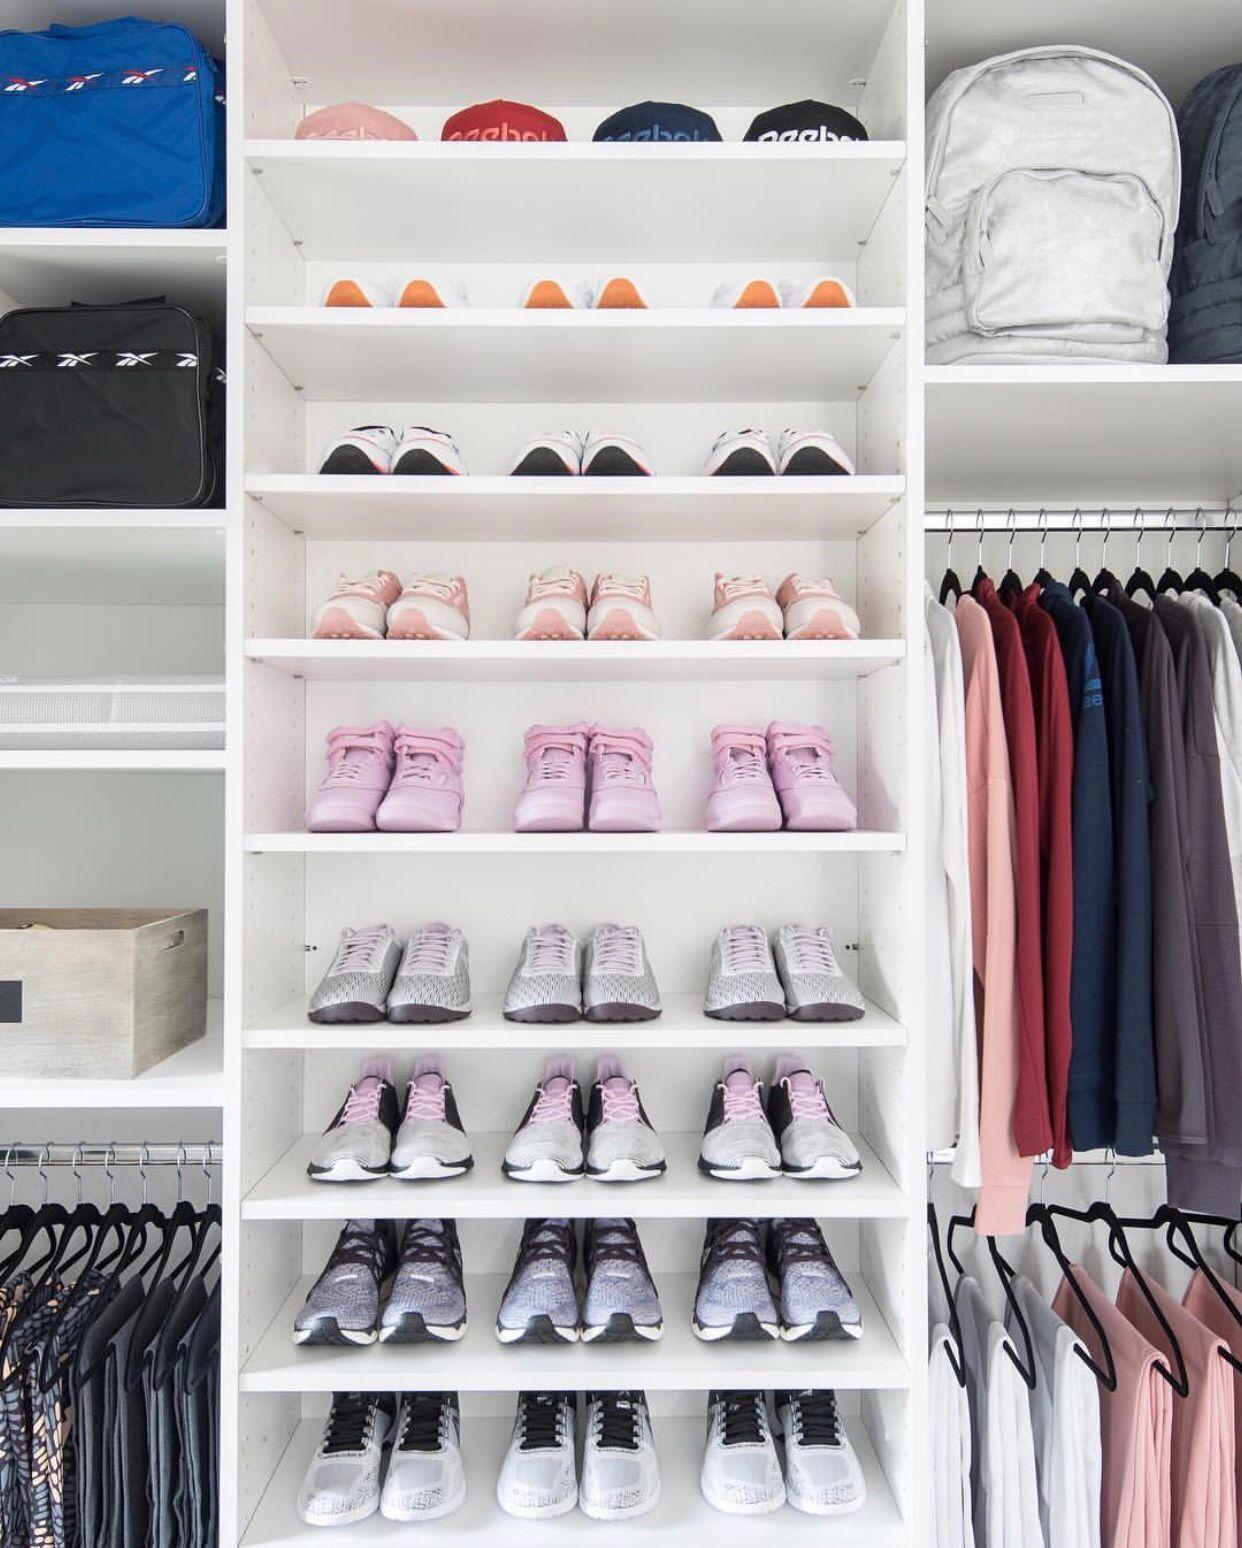 Neat Method Closets Closet Ideas Closet Storage Closet Design Beautiful Closets Desig Closet Design Small Closet Organization Bedroom Closet Organization